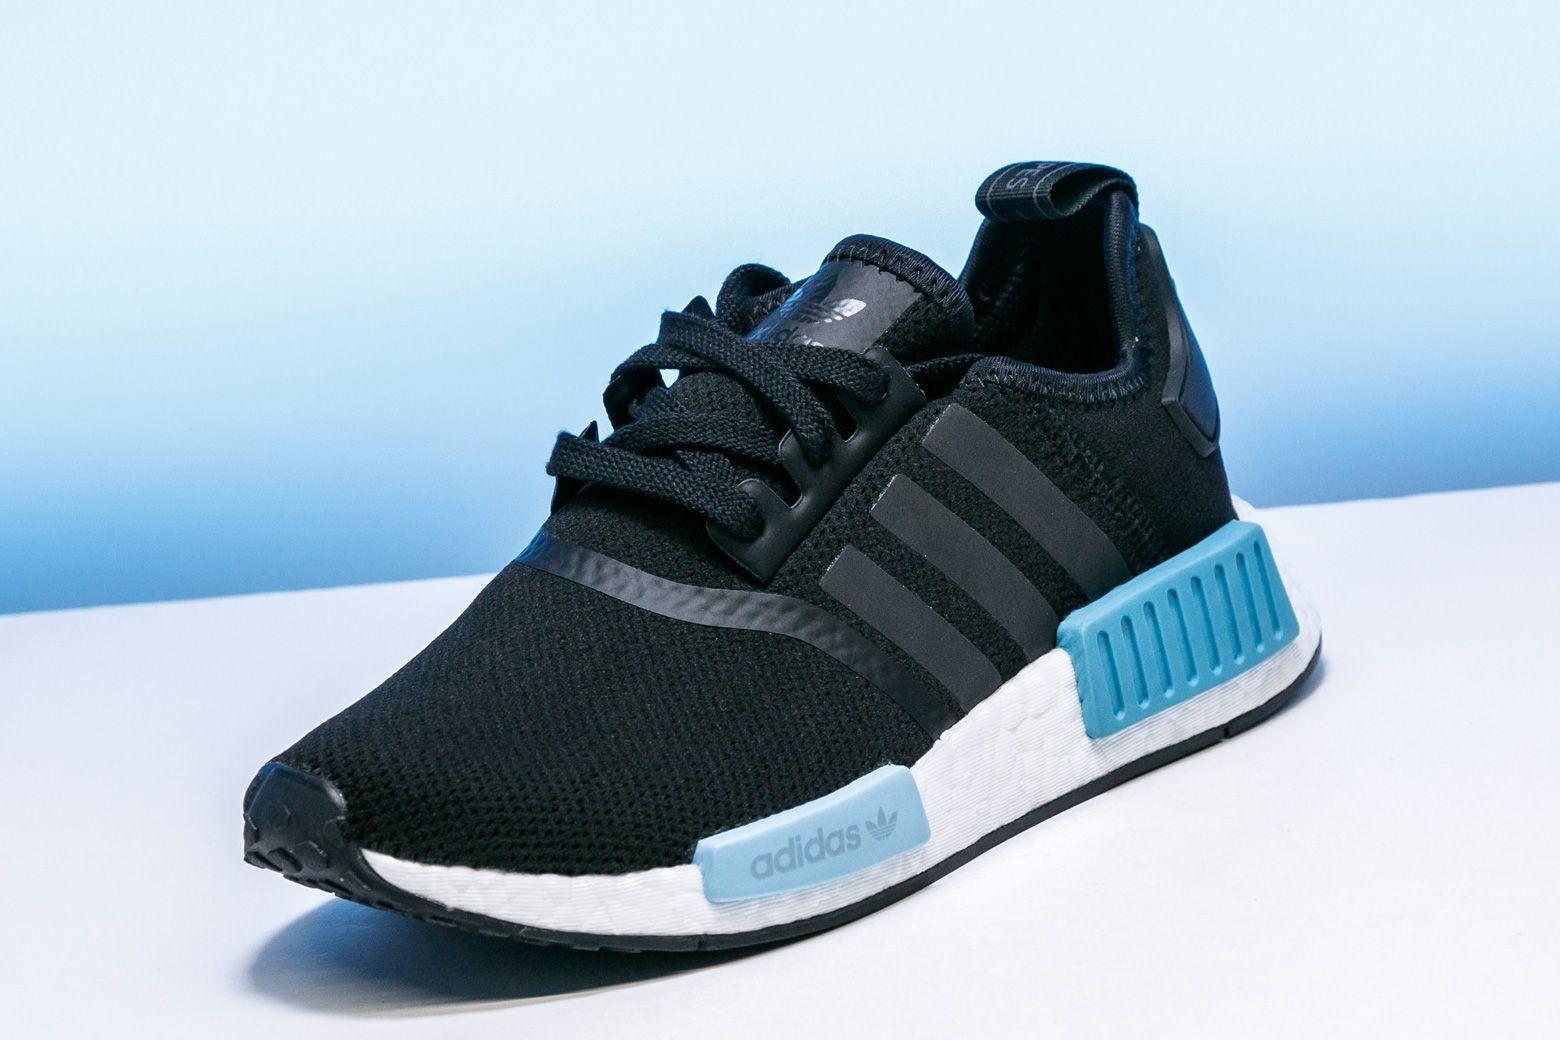 Adidas NMD R1 W Black Icey Blue Light Ice BY9951 Mesh